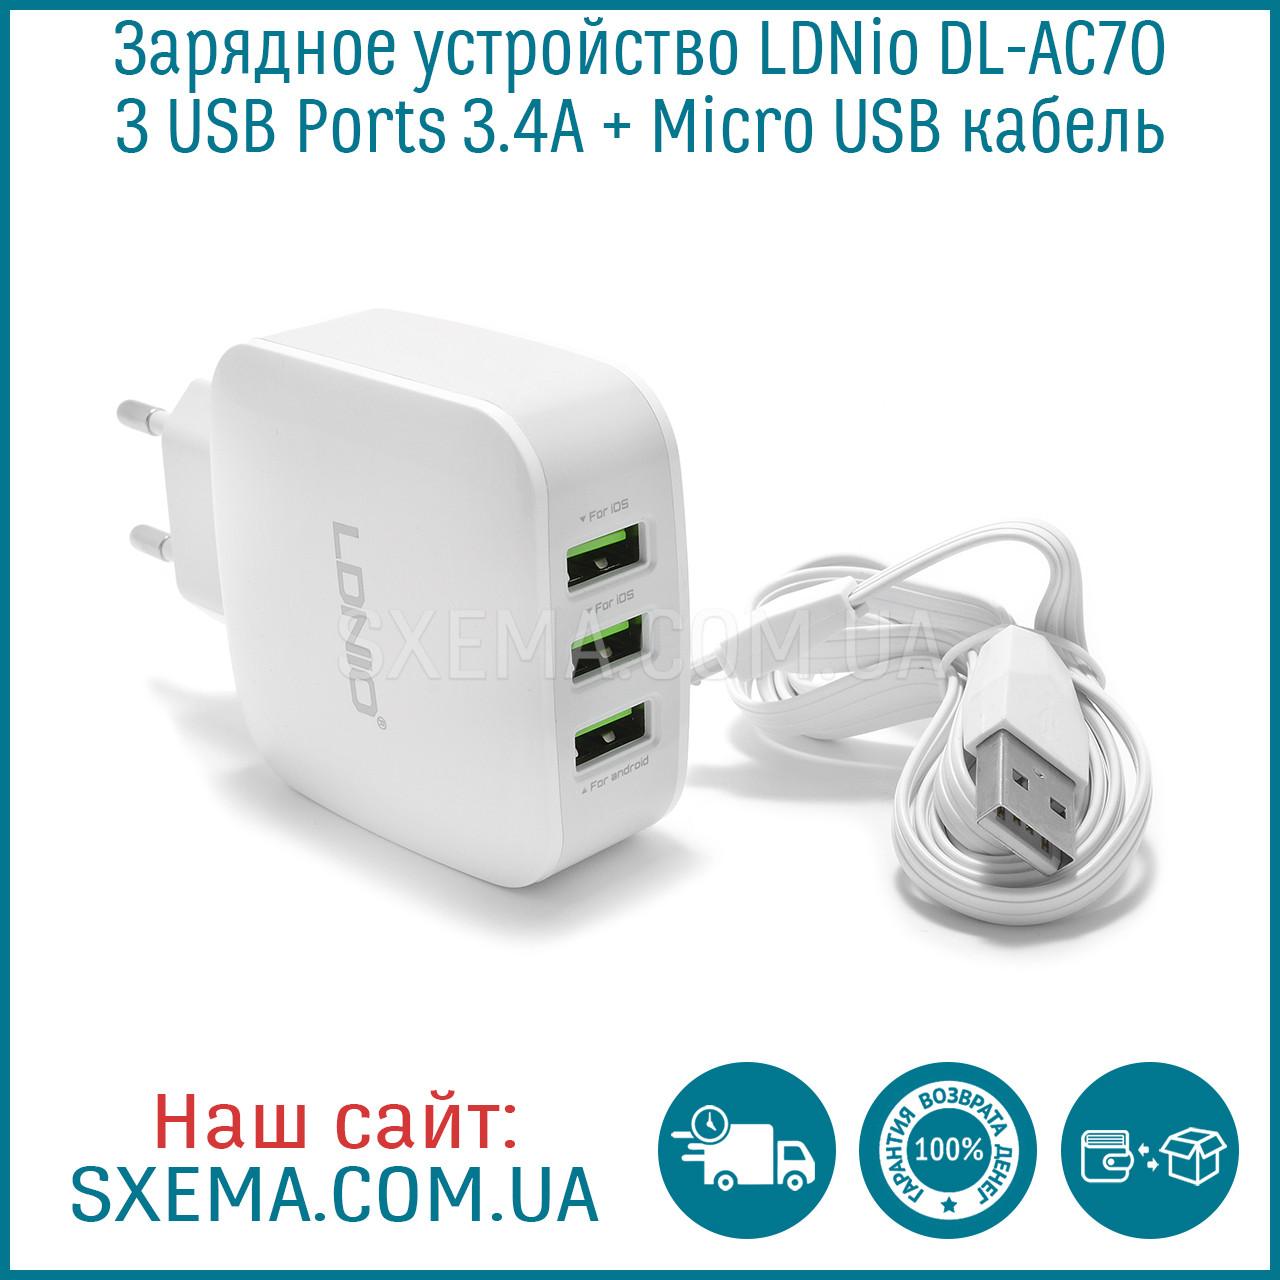 Сетевое зарядное устройство LDNIO DL-AC70 3xUSB 3.4A + кабель micro USB